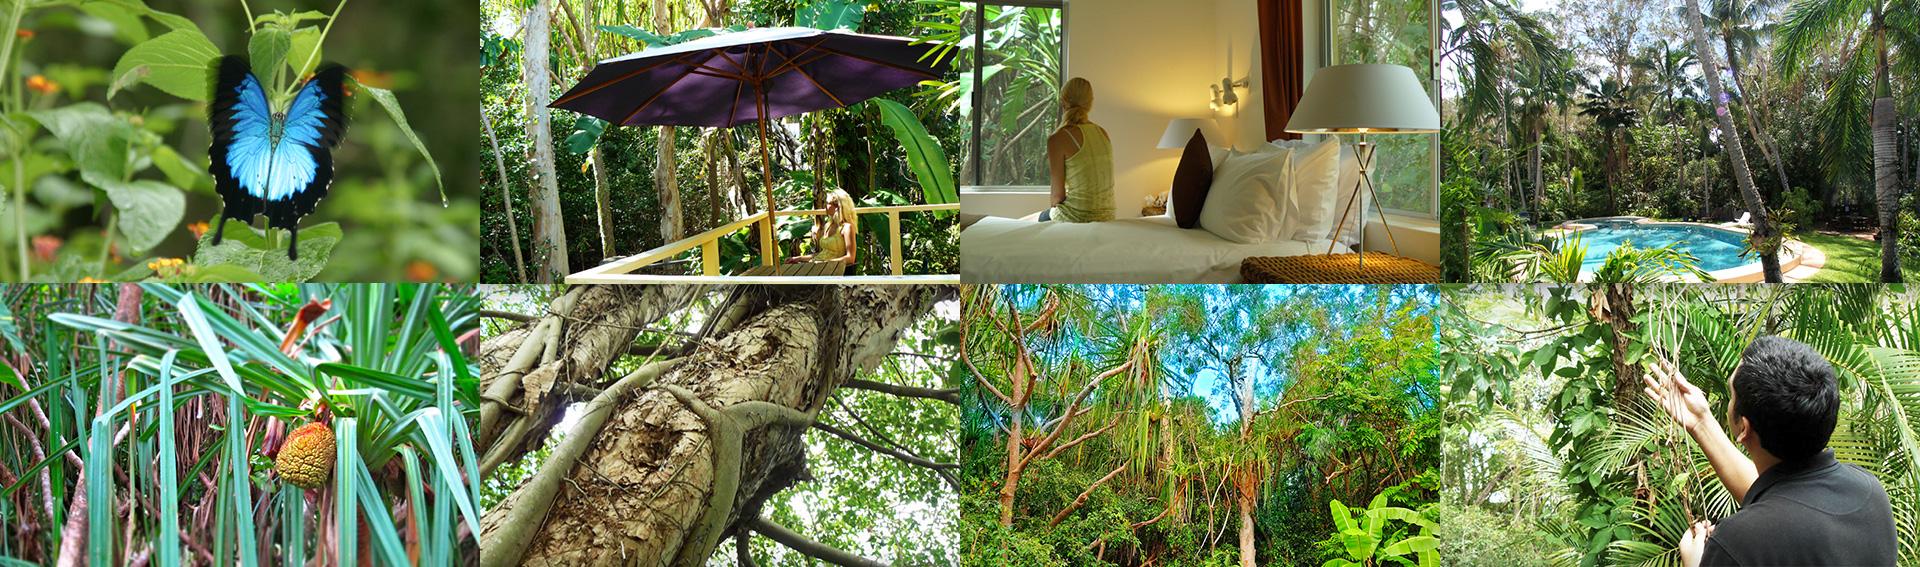 Villa Marine Cairns rainforest apartment collage